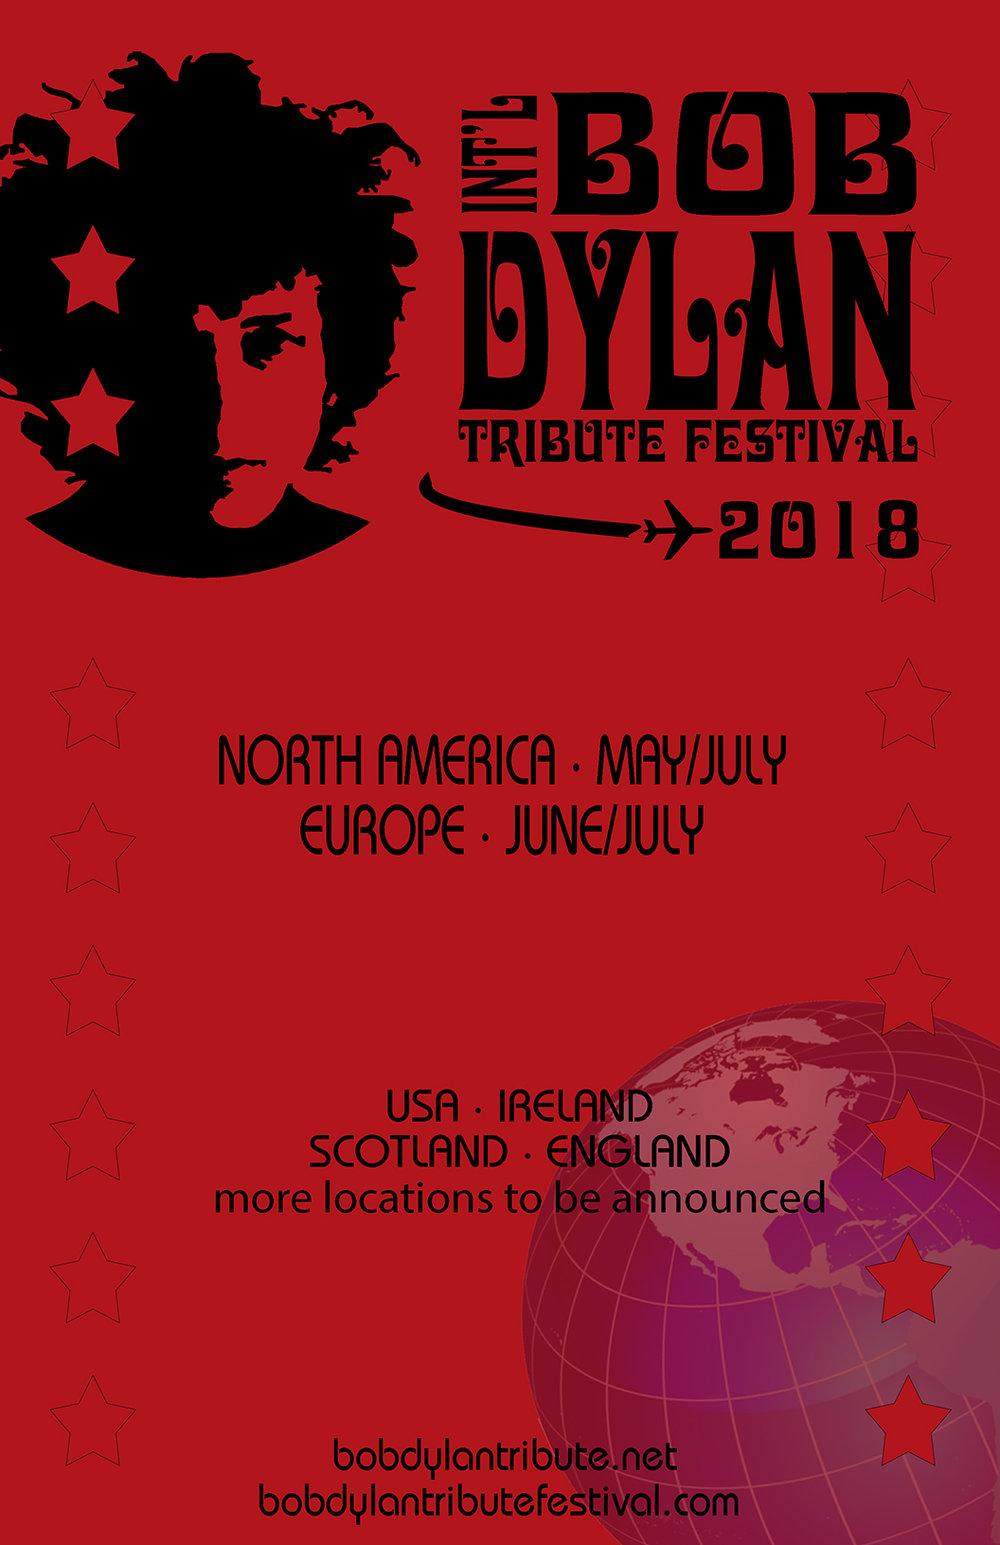 Dylan77-2018-POSTER-GEN-3-96K.jpg